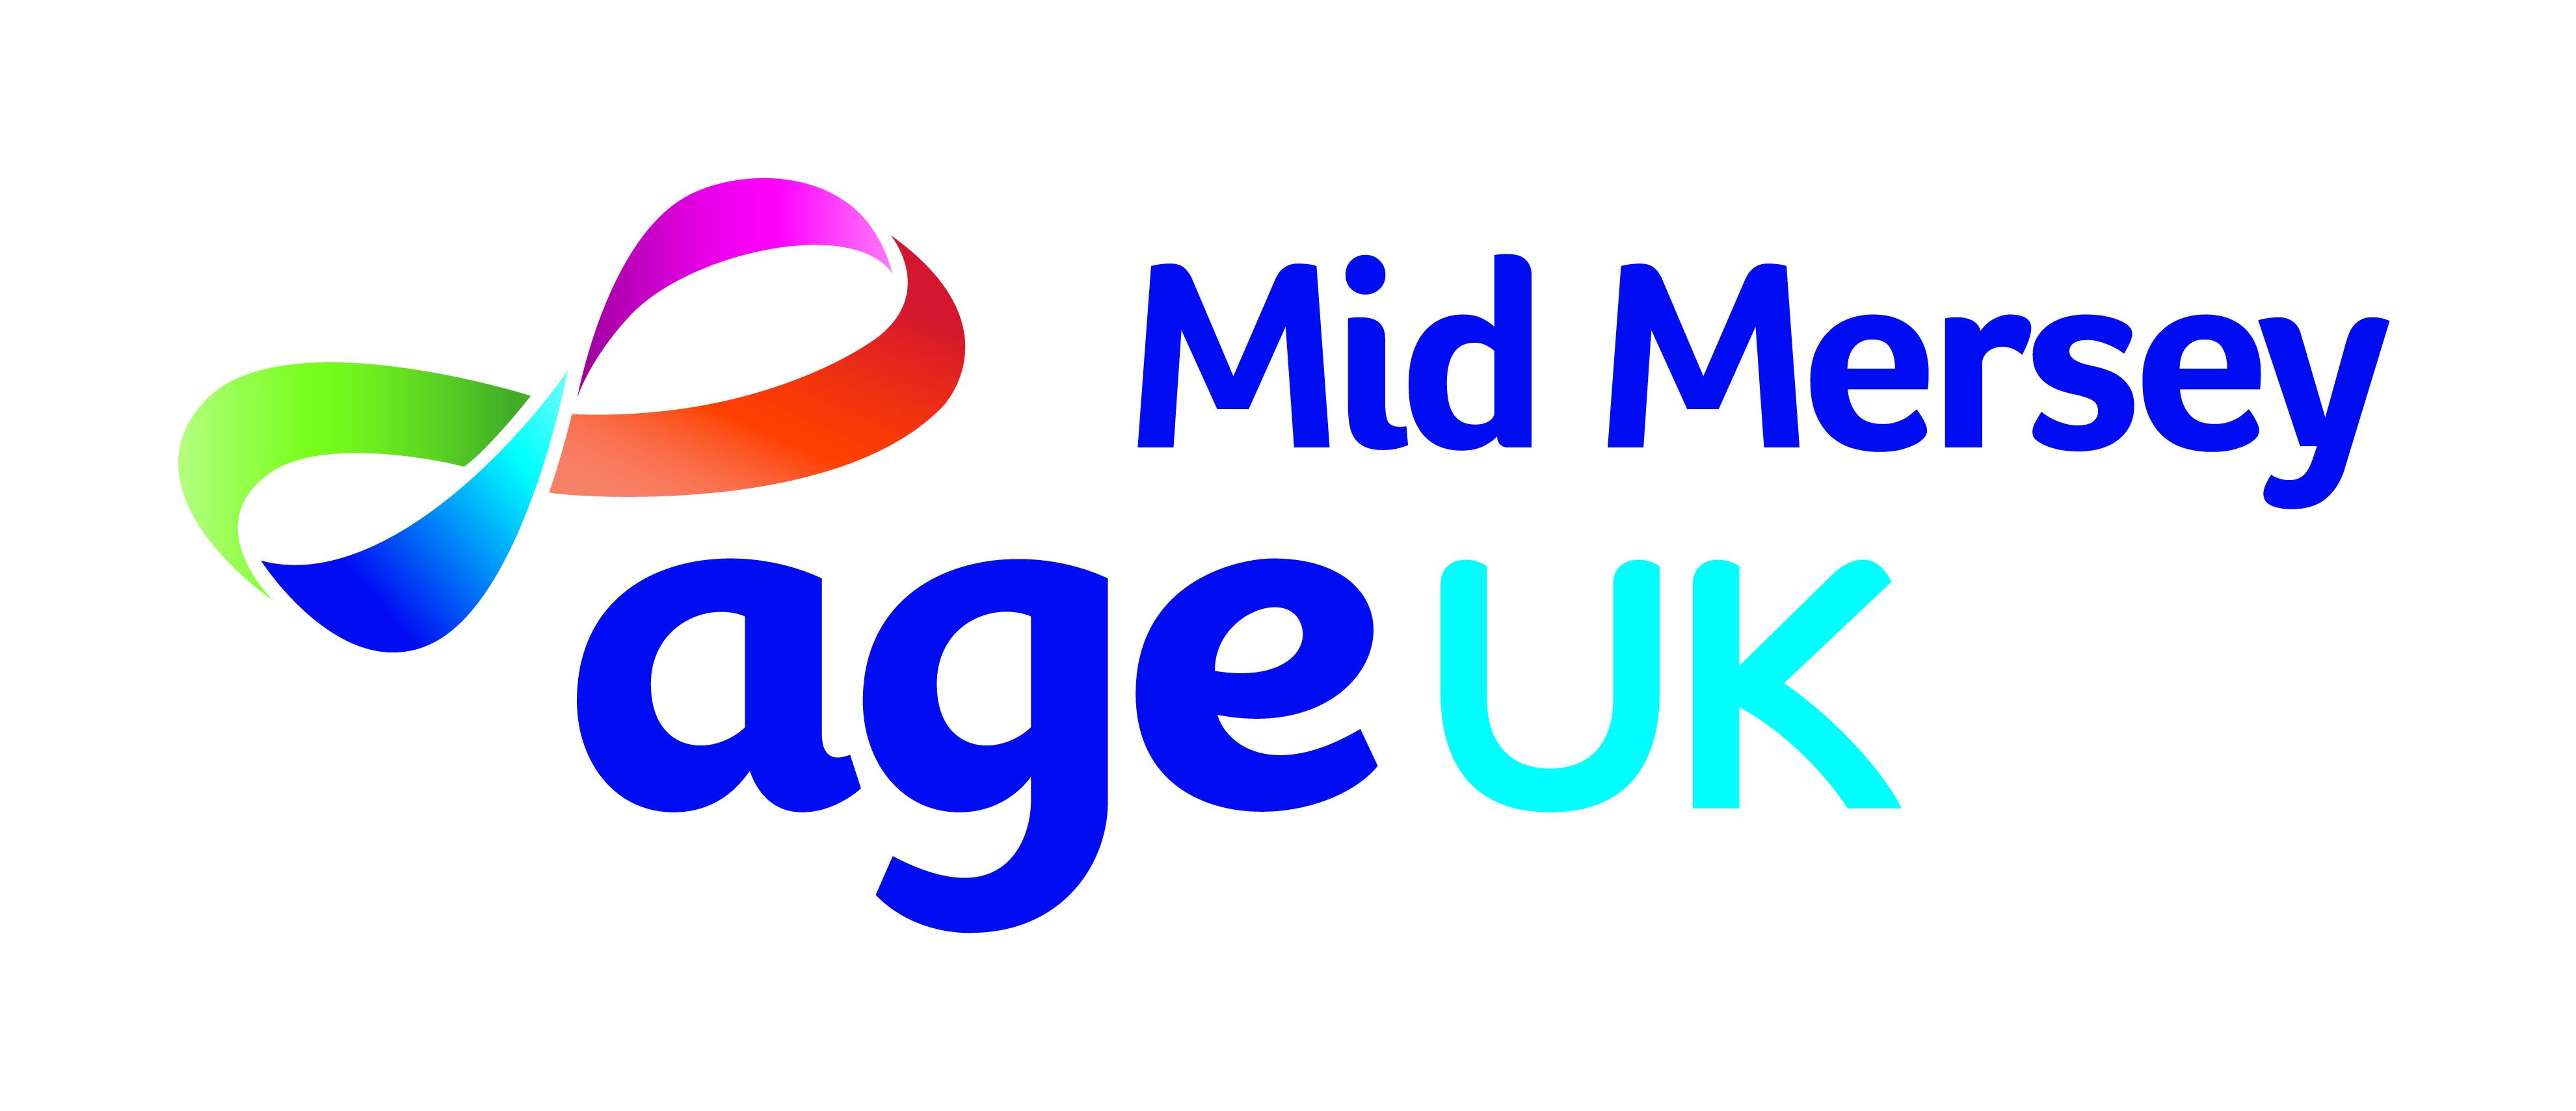 Age UK Mid Mersey Logo